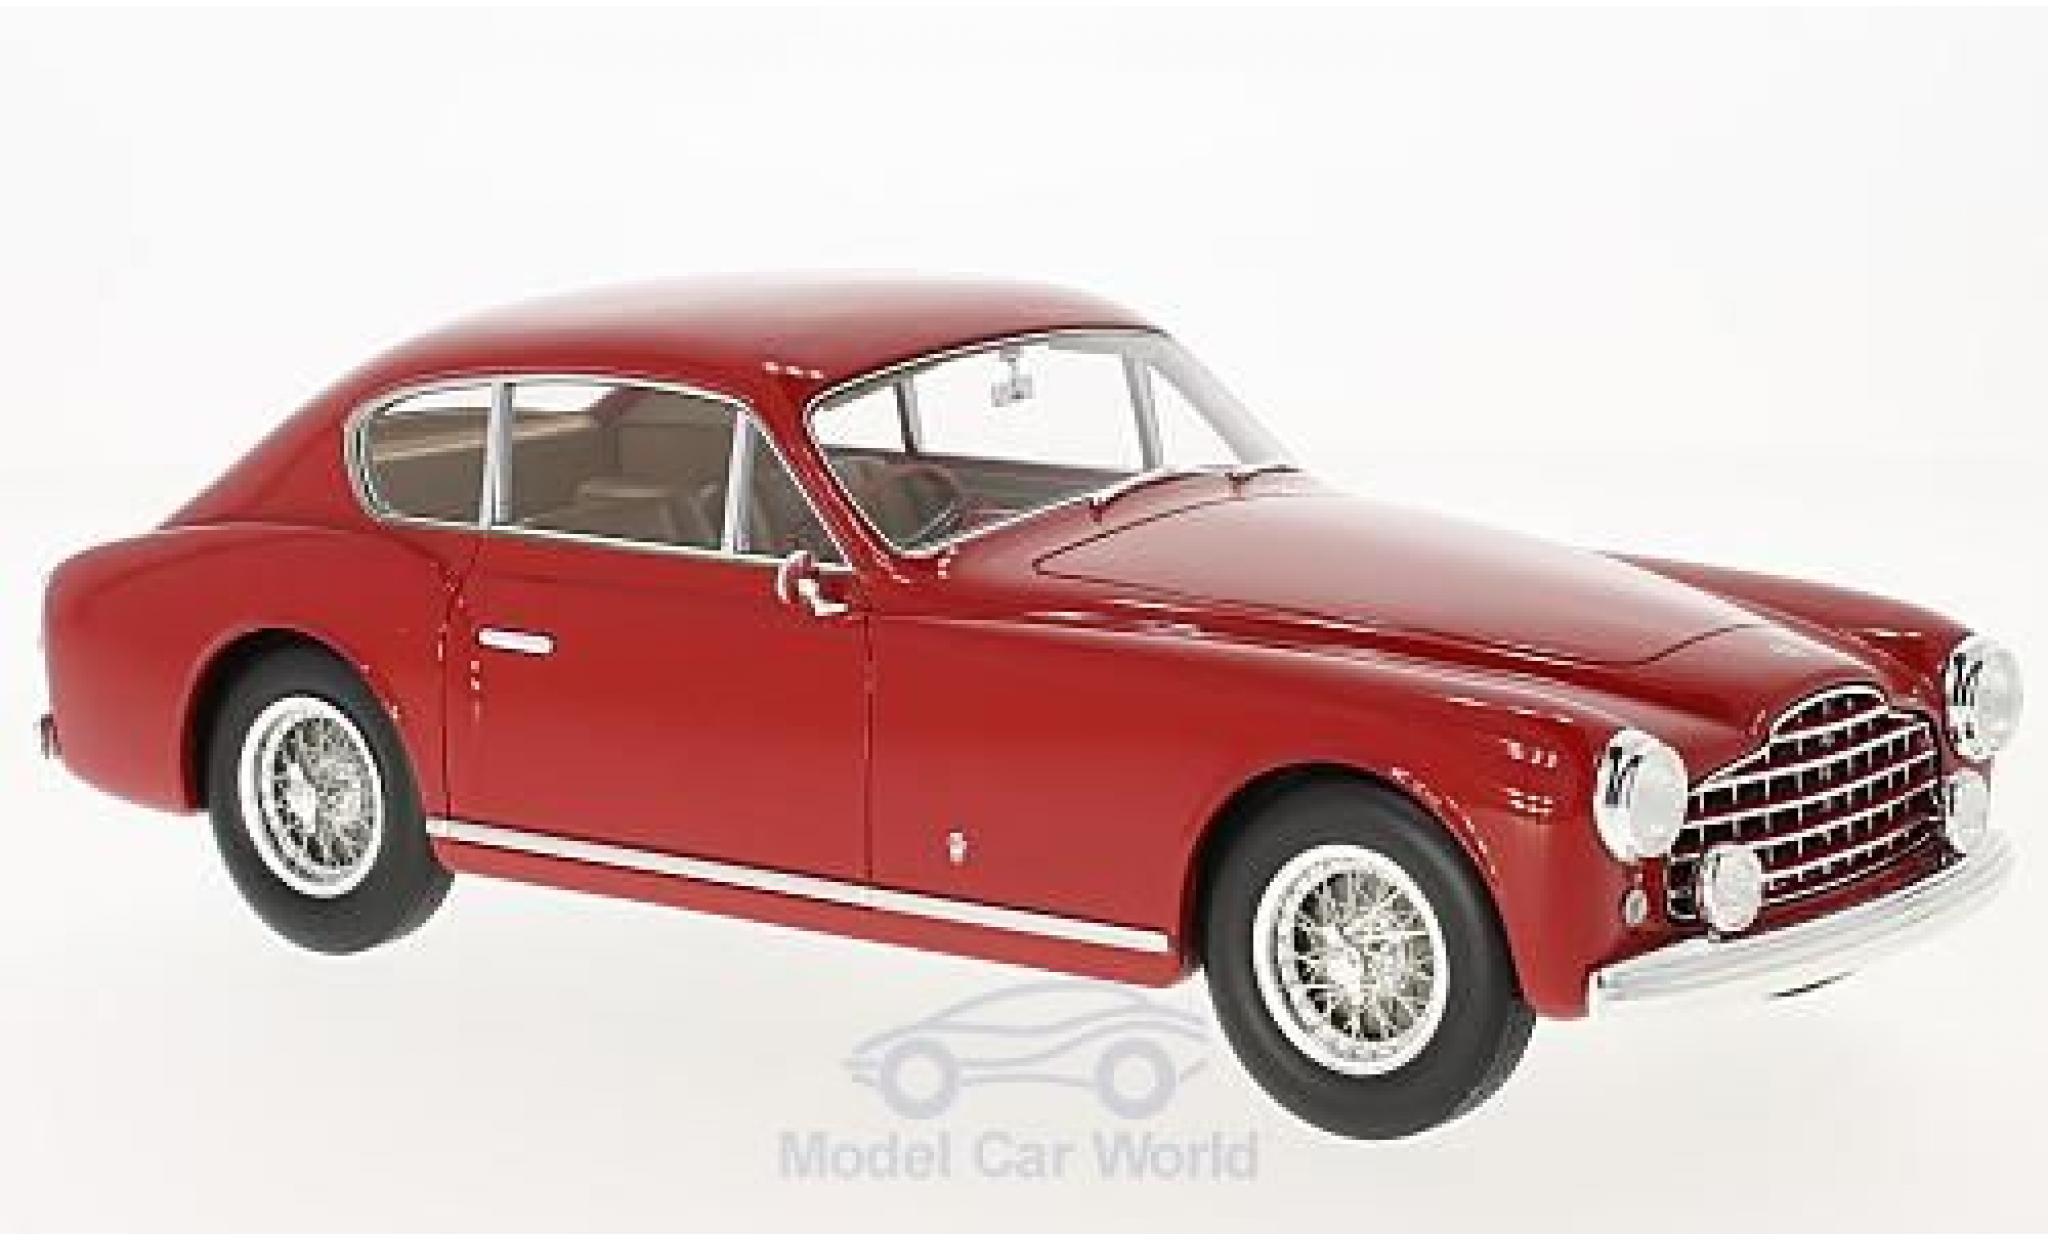 Ferrari 195 1/18 BoS Models Inter Ghia rouge RHD 0